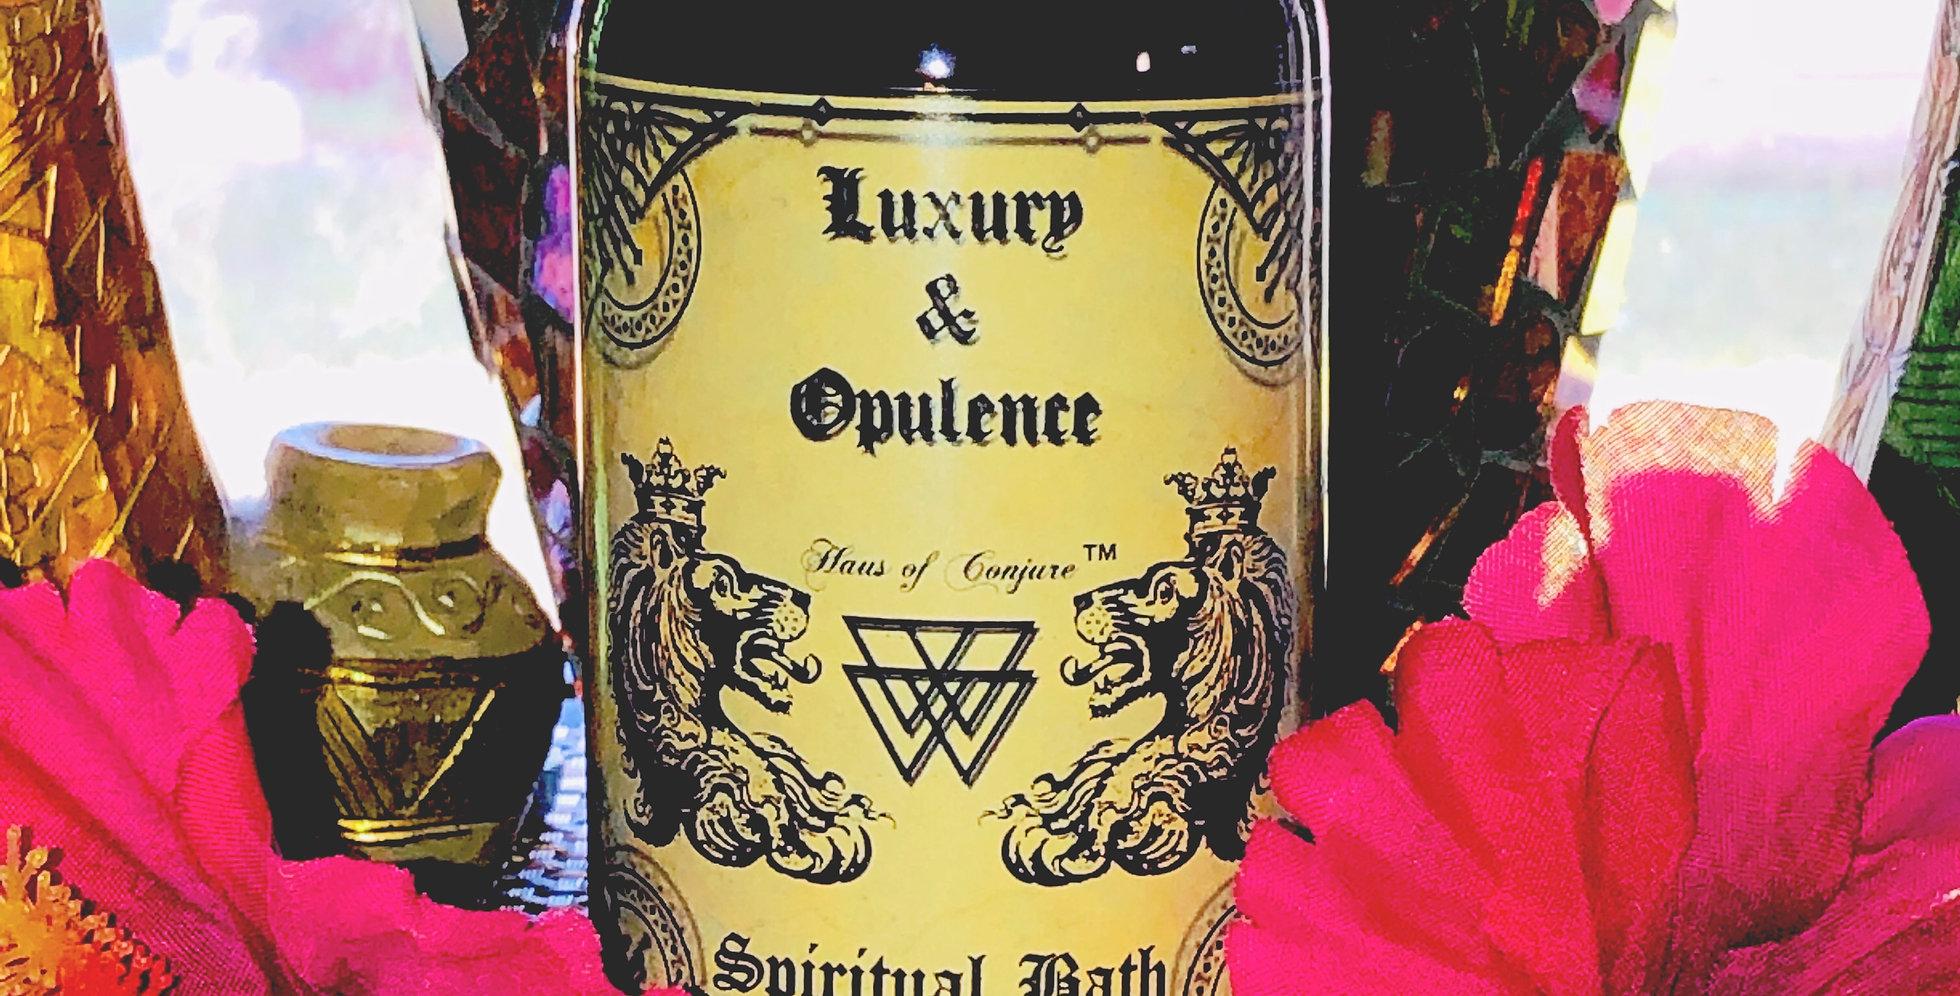 Luxury & Opulence Spiritual Bath